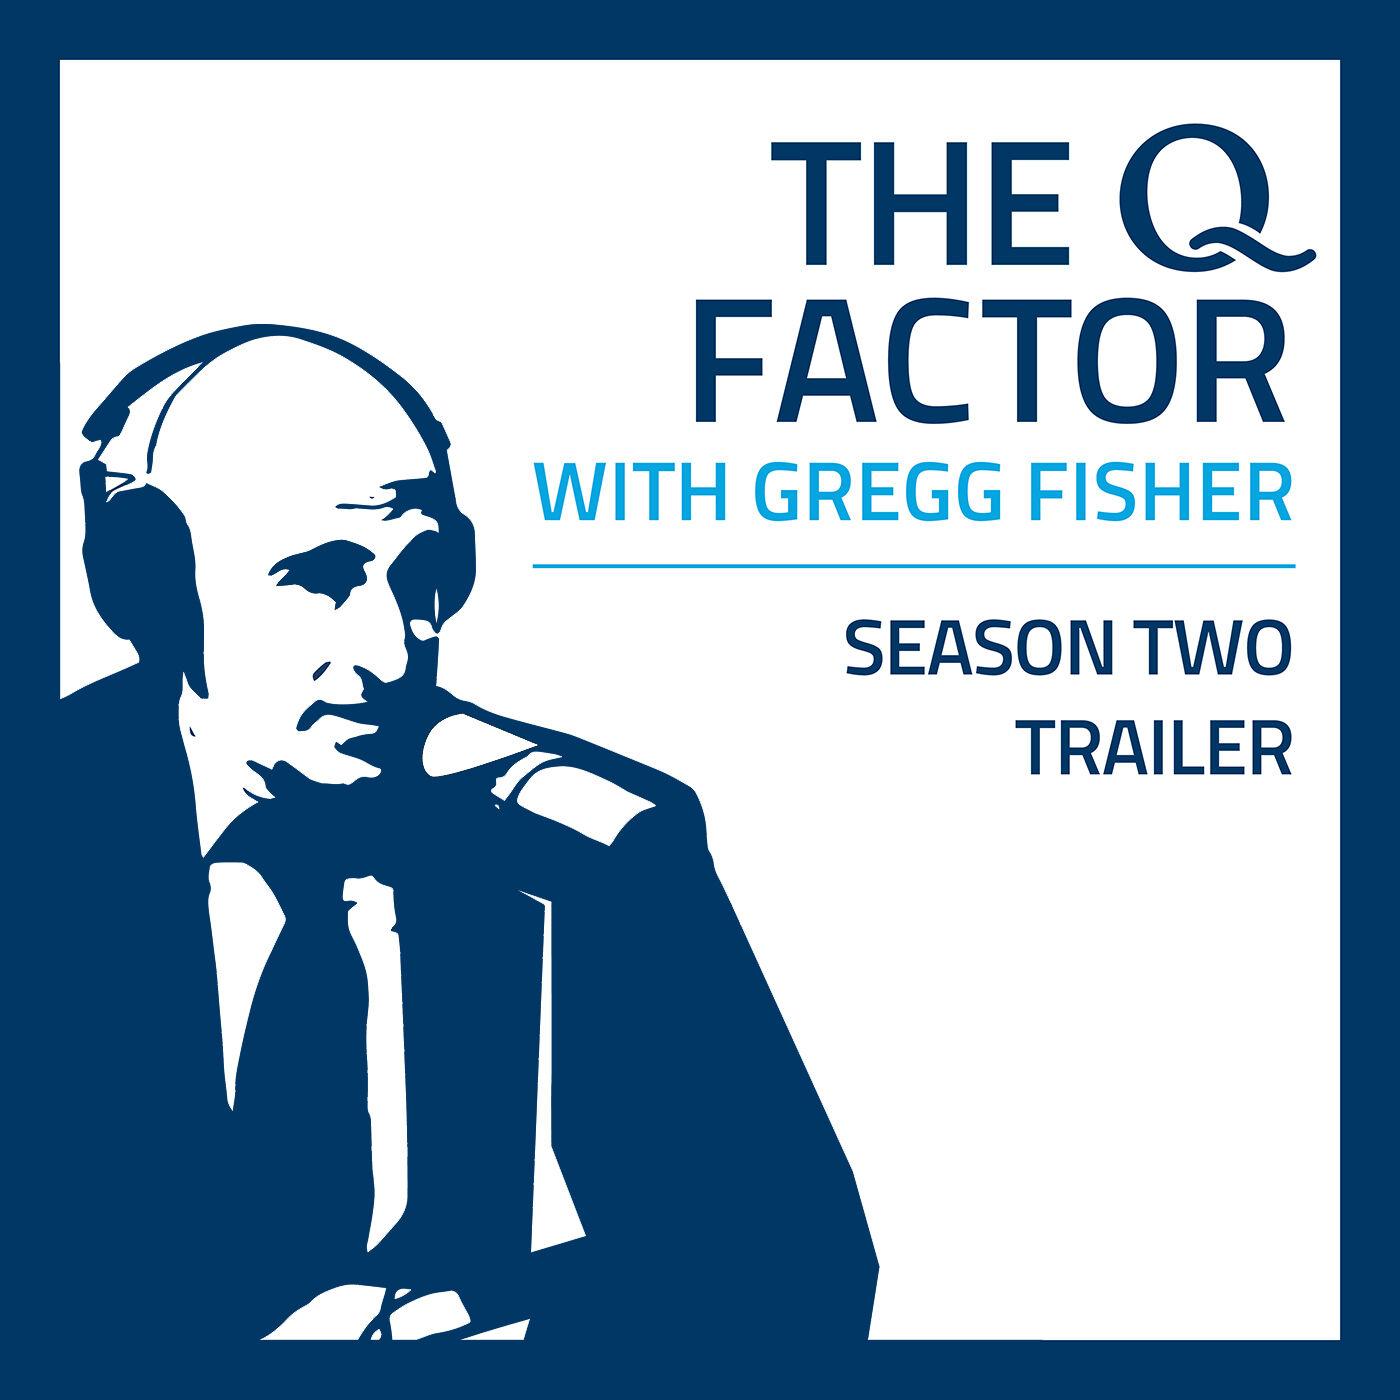 THE Q FACTOR: SEASON TWO TRAILER